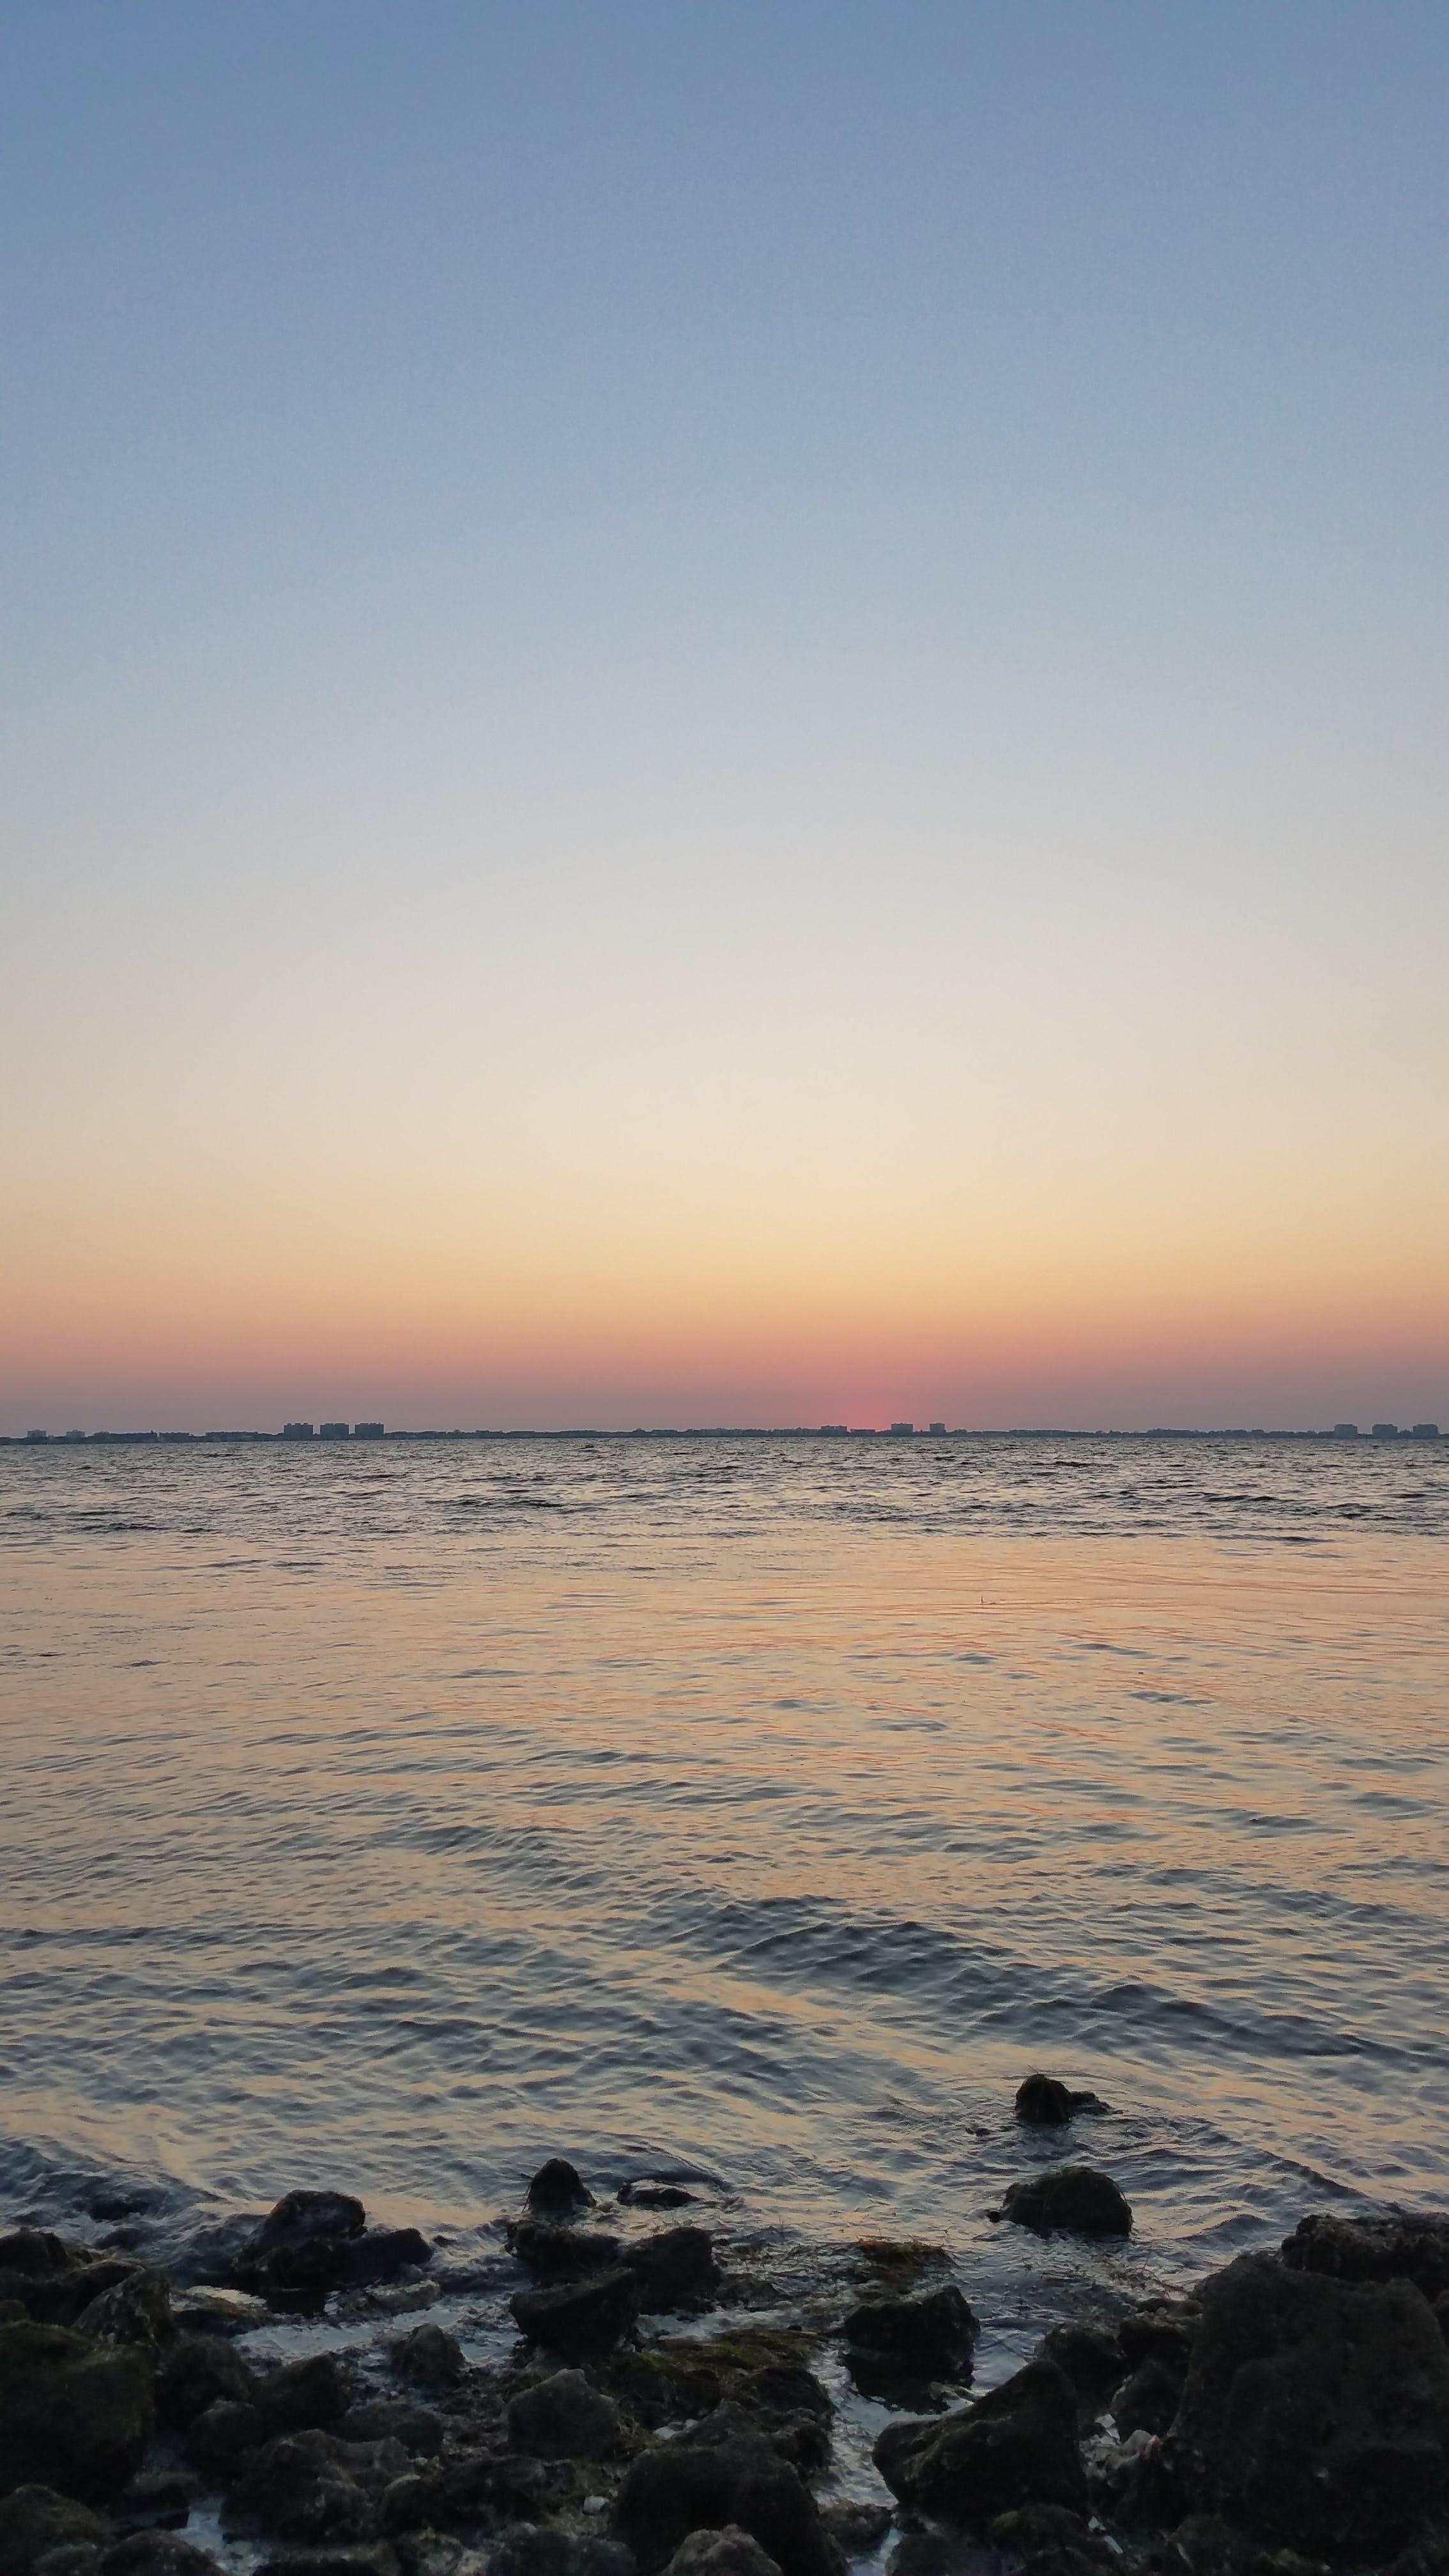 Kostenloses Stock Foto zu #sunset #florida #water #light #warm #ocean